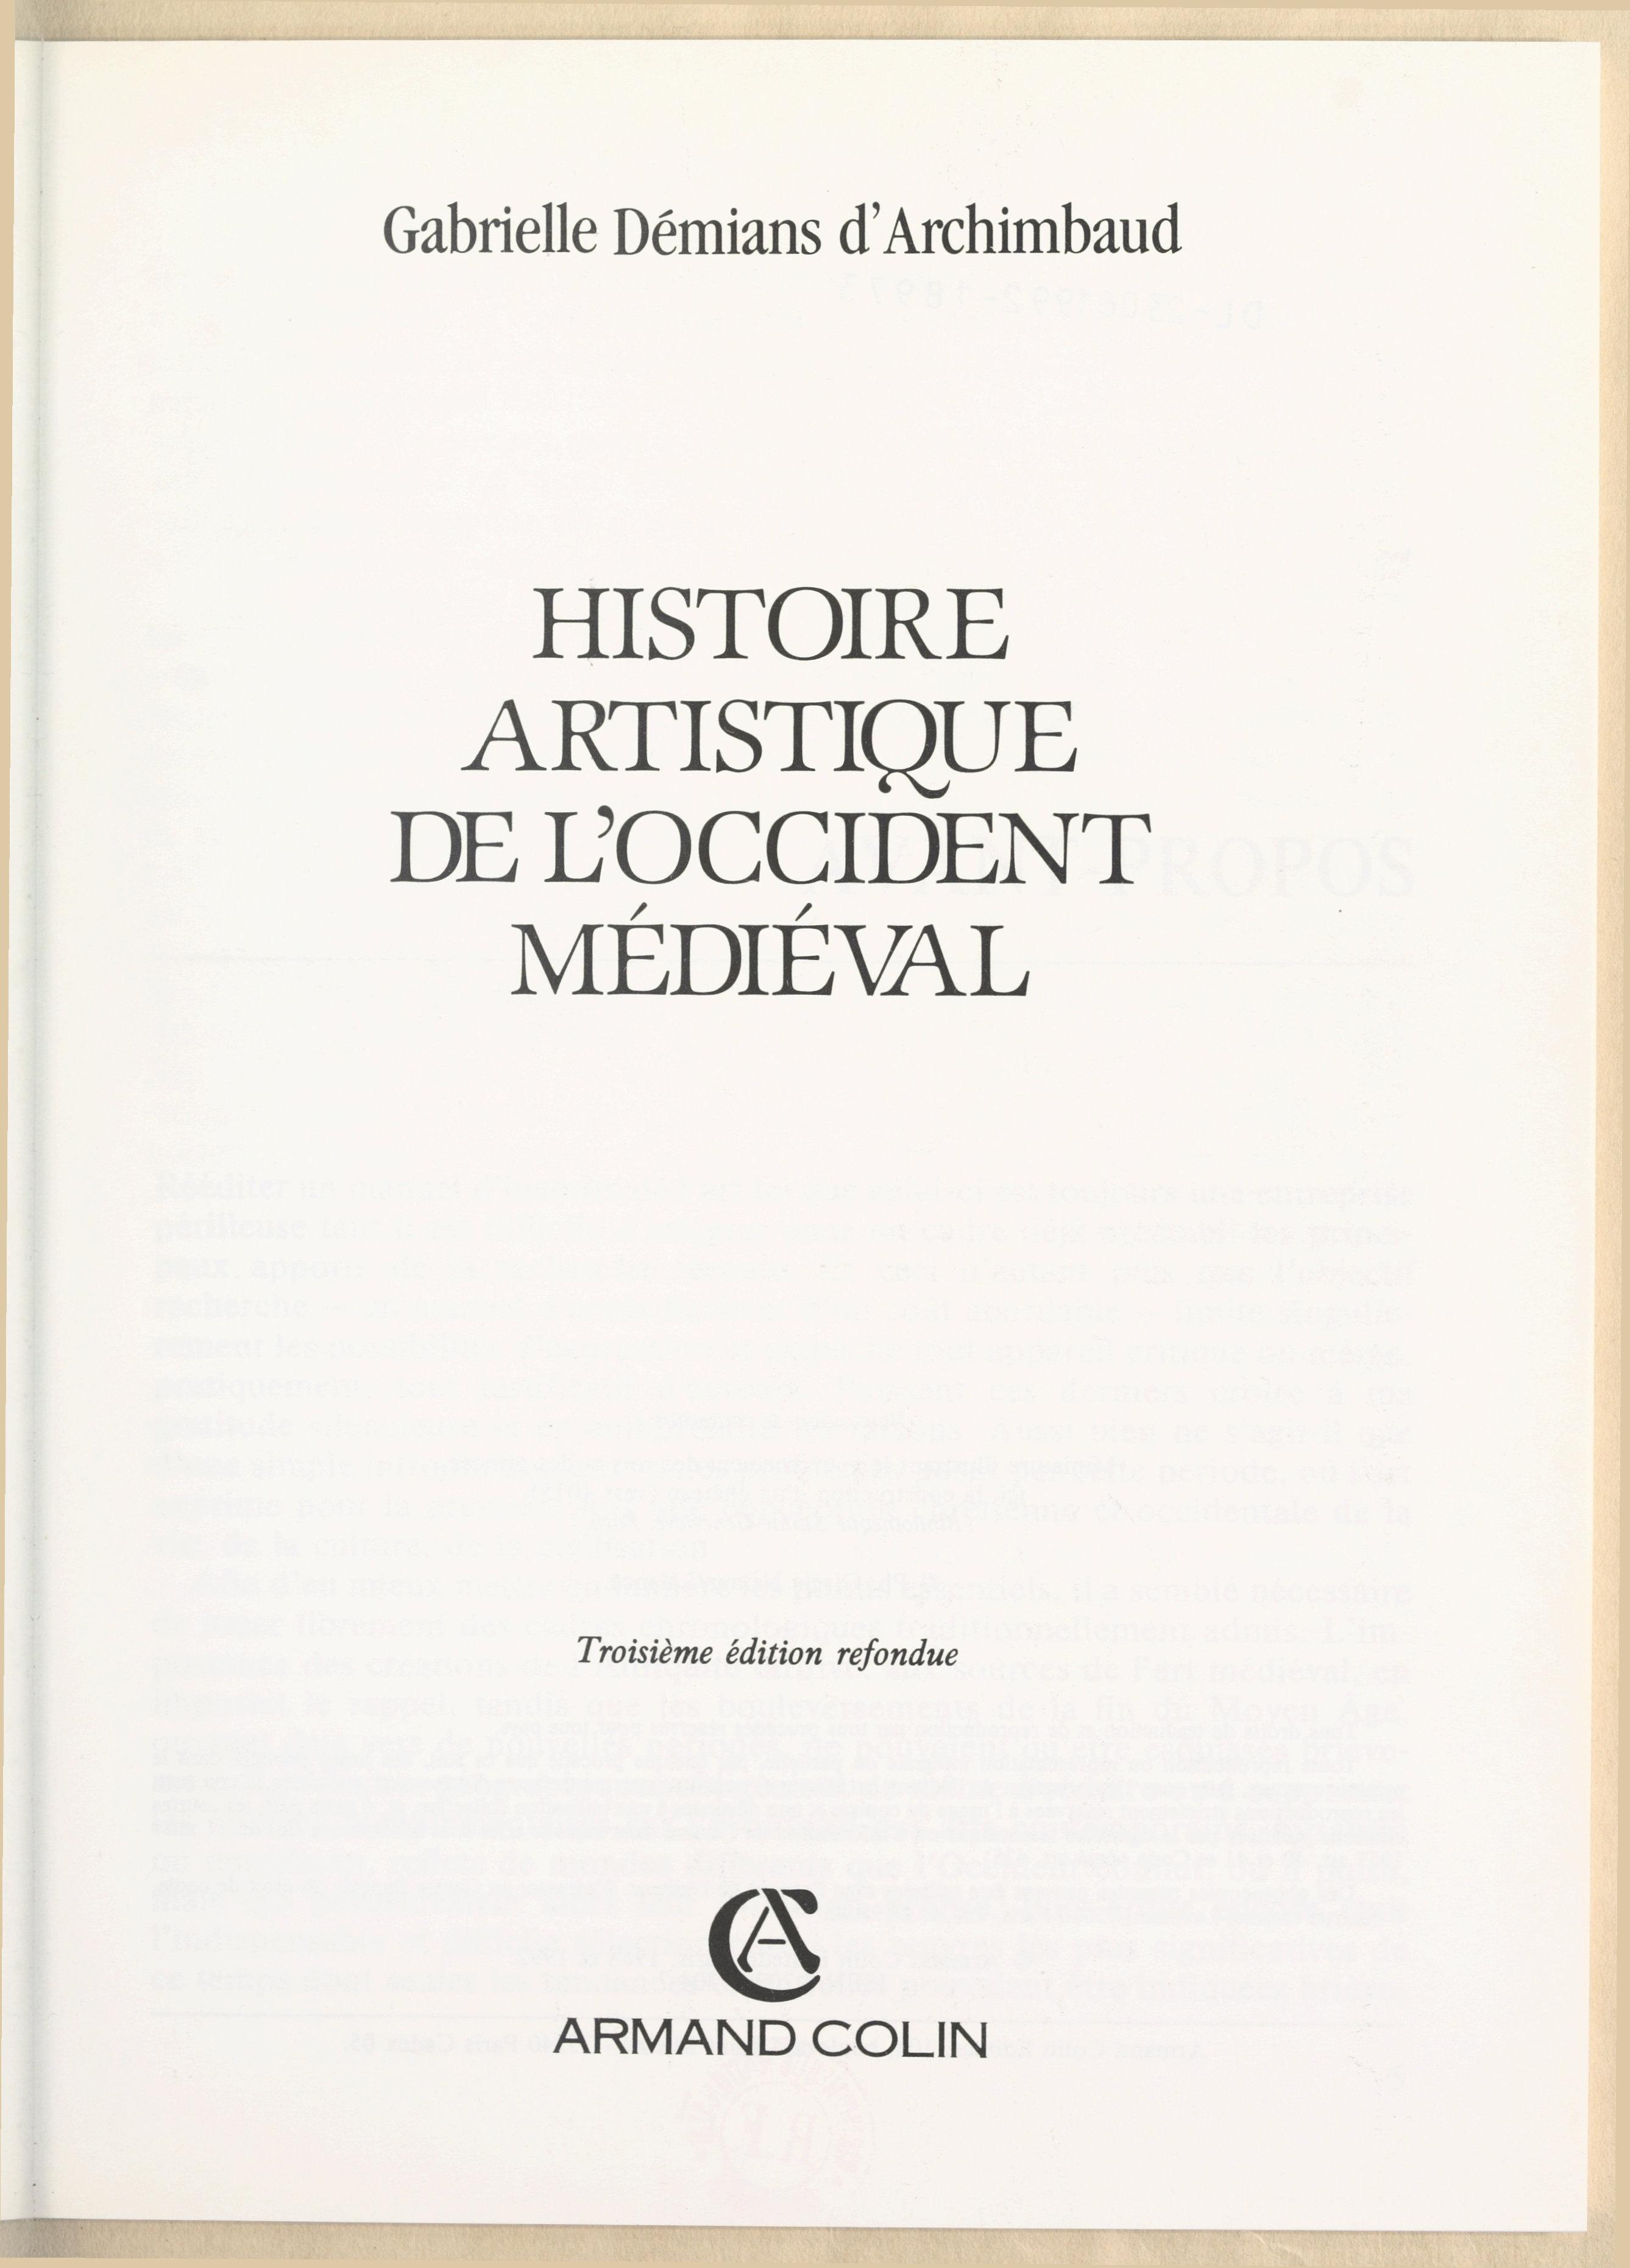 Histoire artistique de l'Oc...